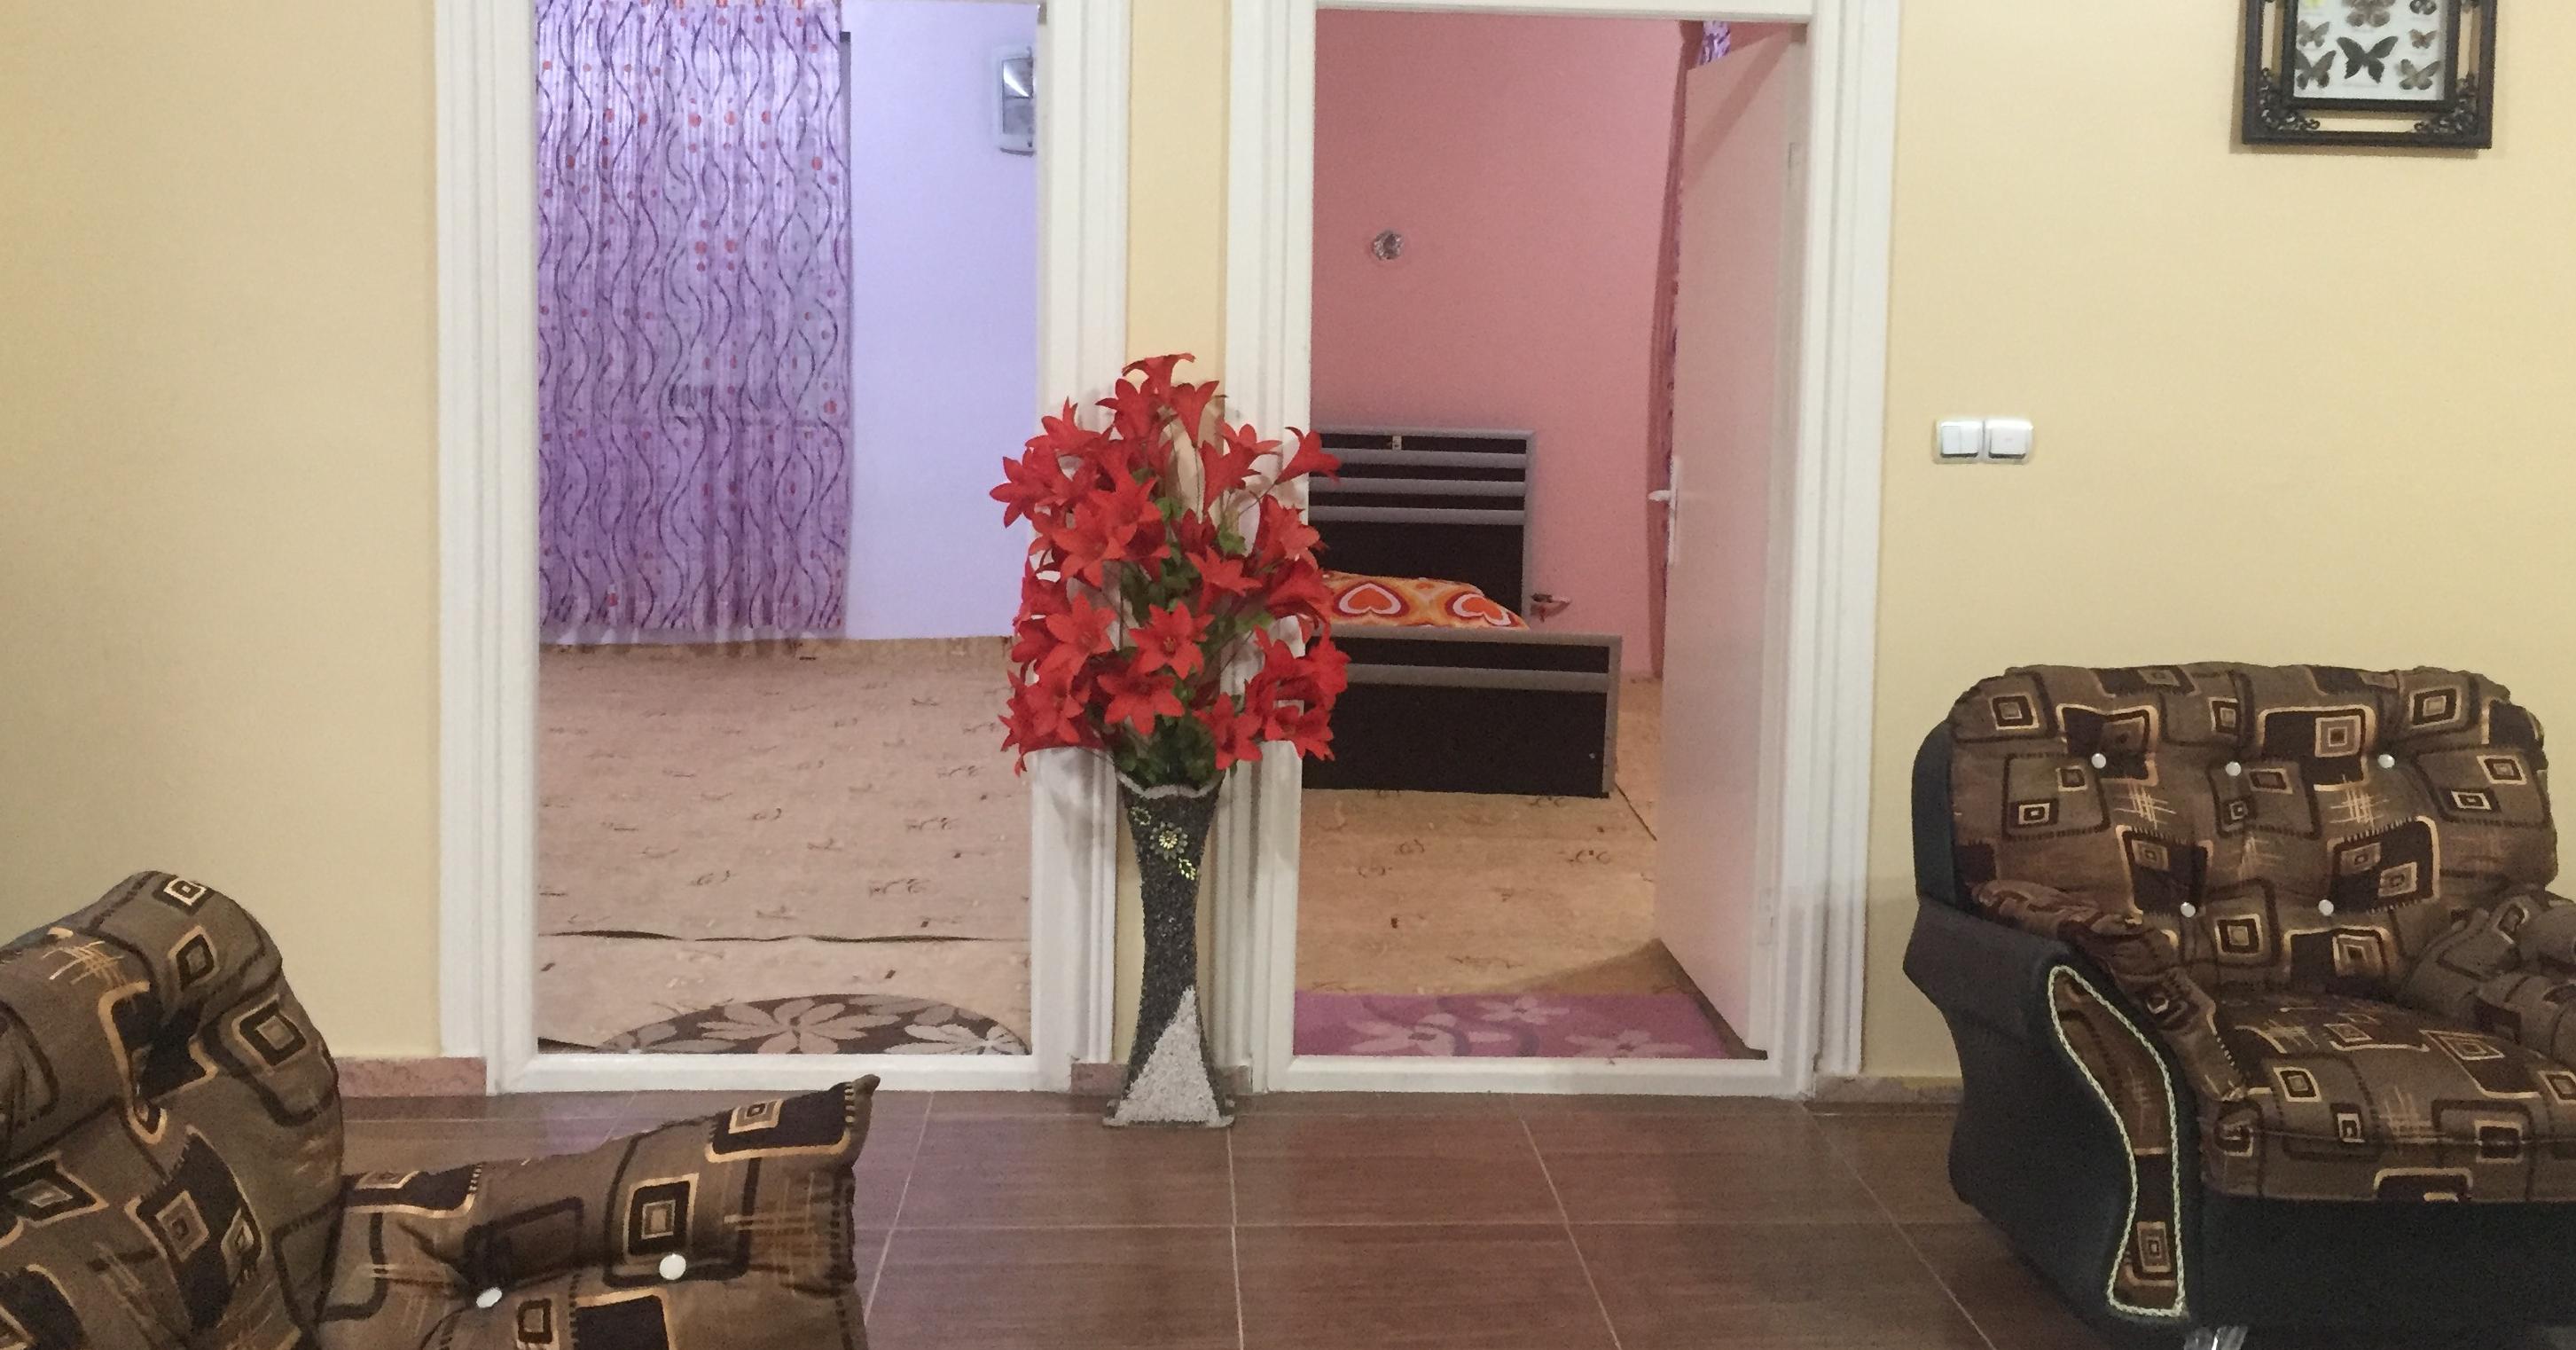 townee منزل ویلایی در عباسپور رامسر